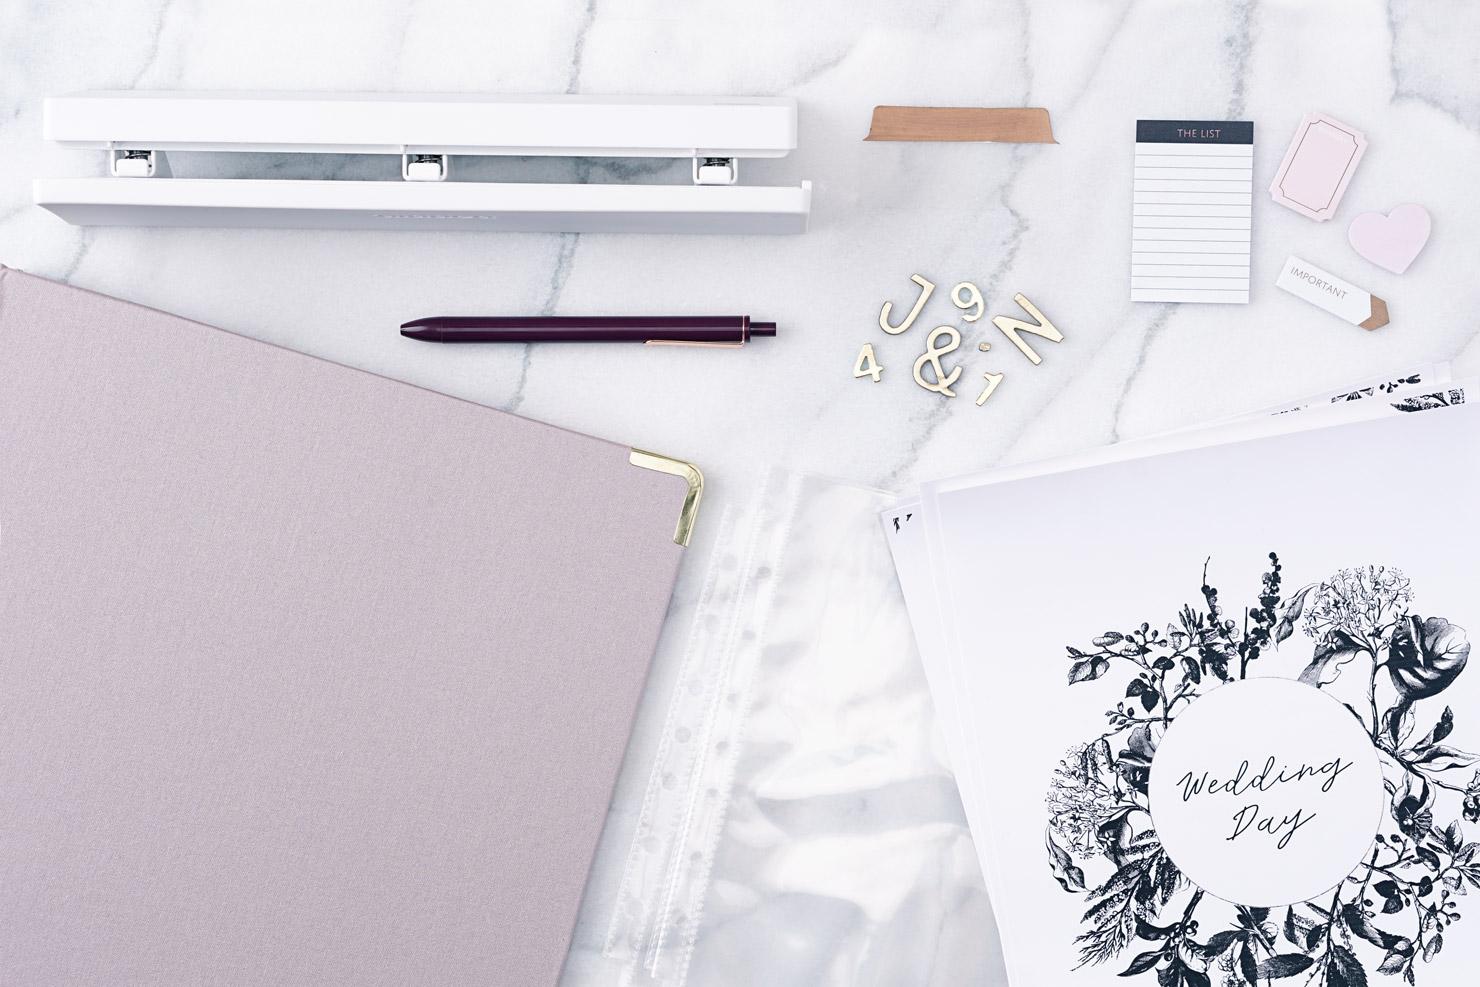 wedding-planner-materials.jpg